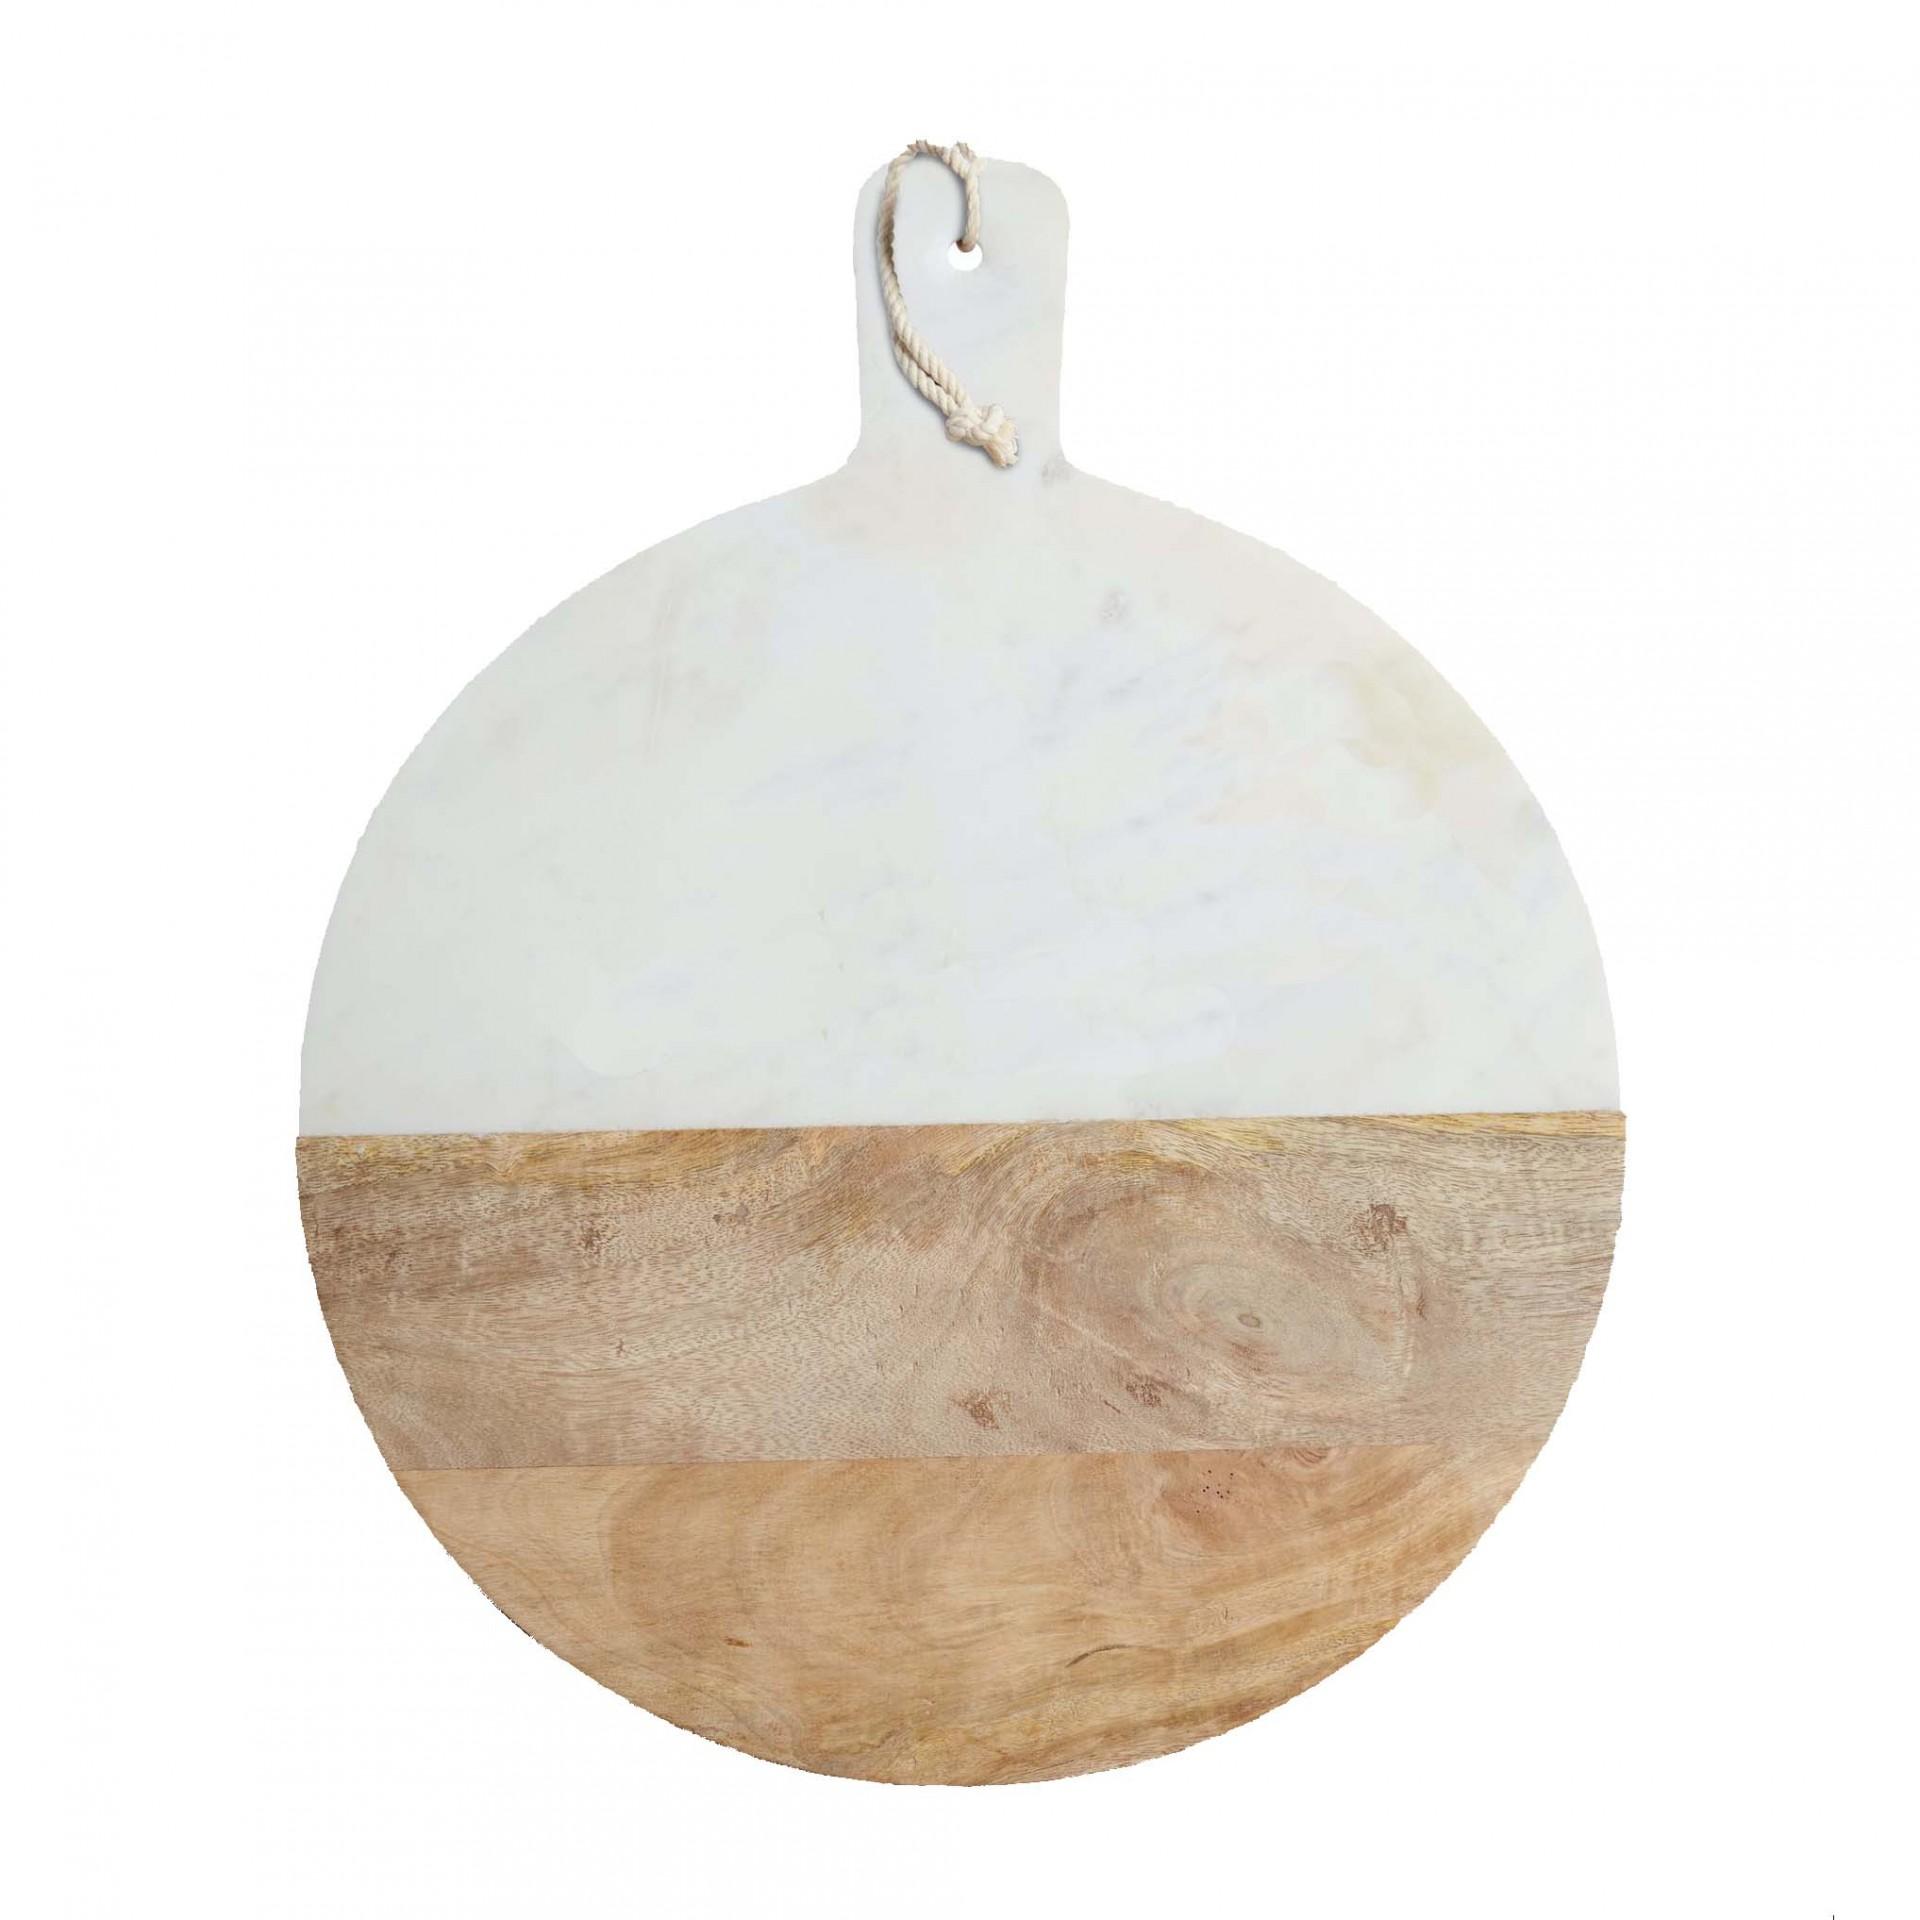 Marble & Wood Paddle Serving Board _ Ø40cm